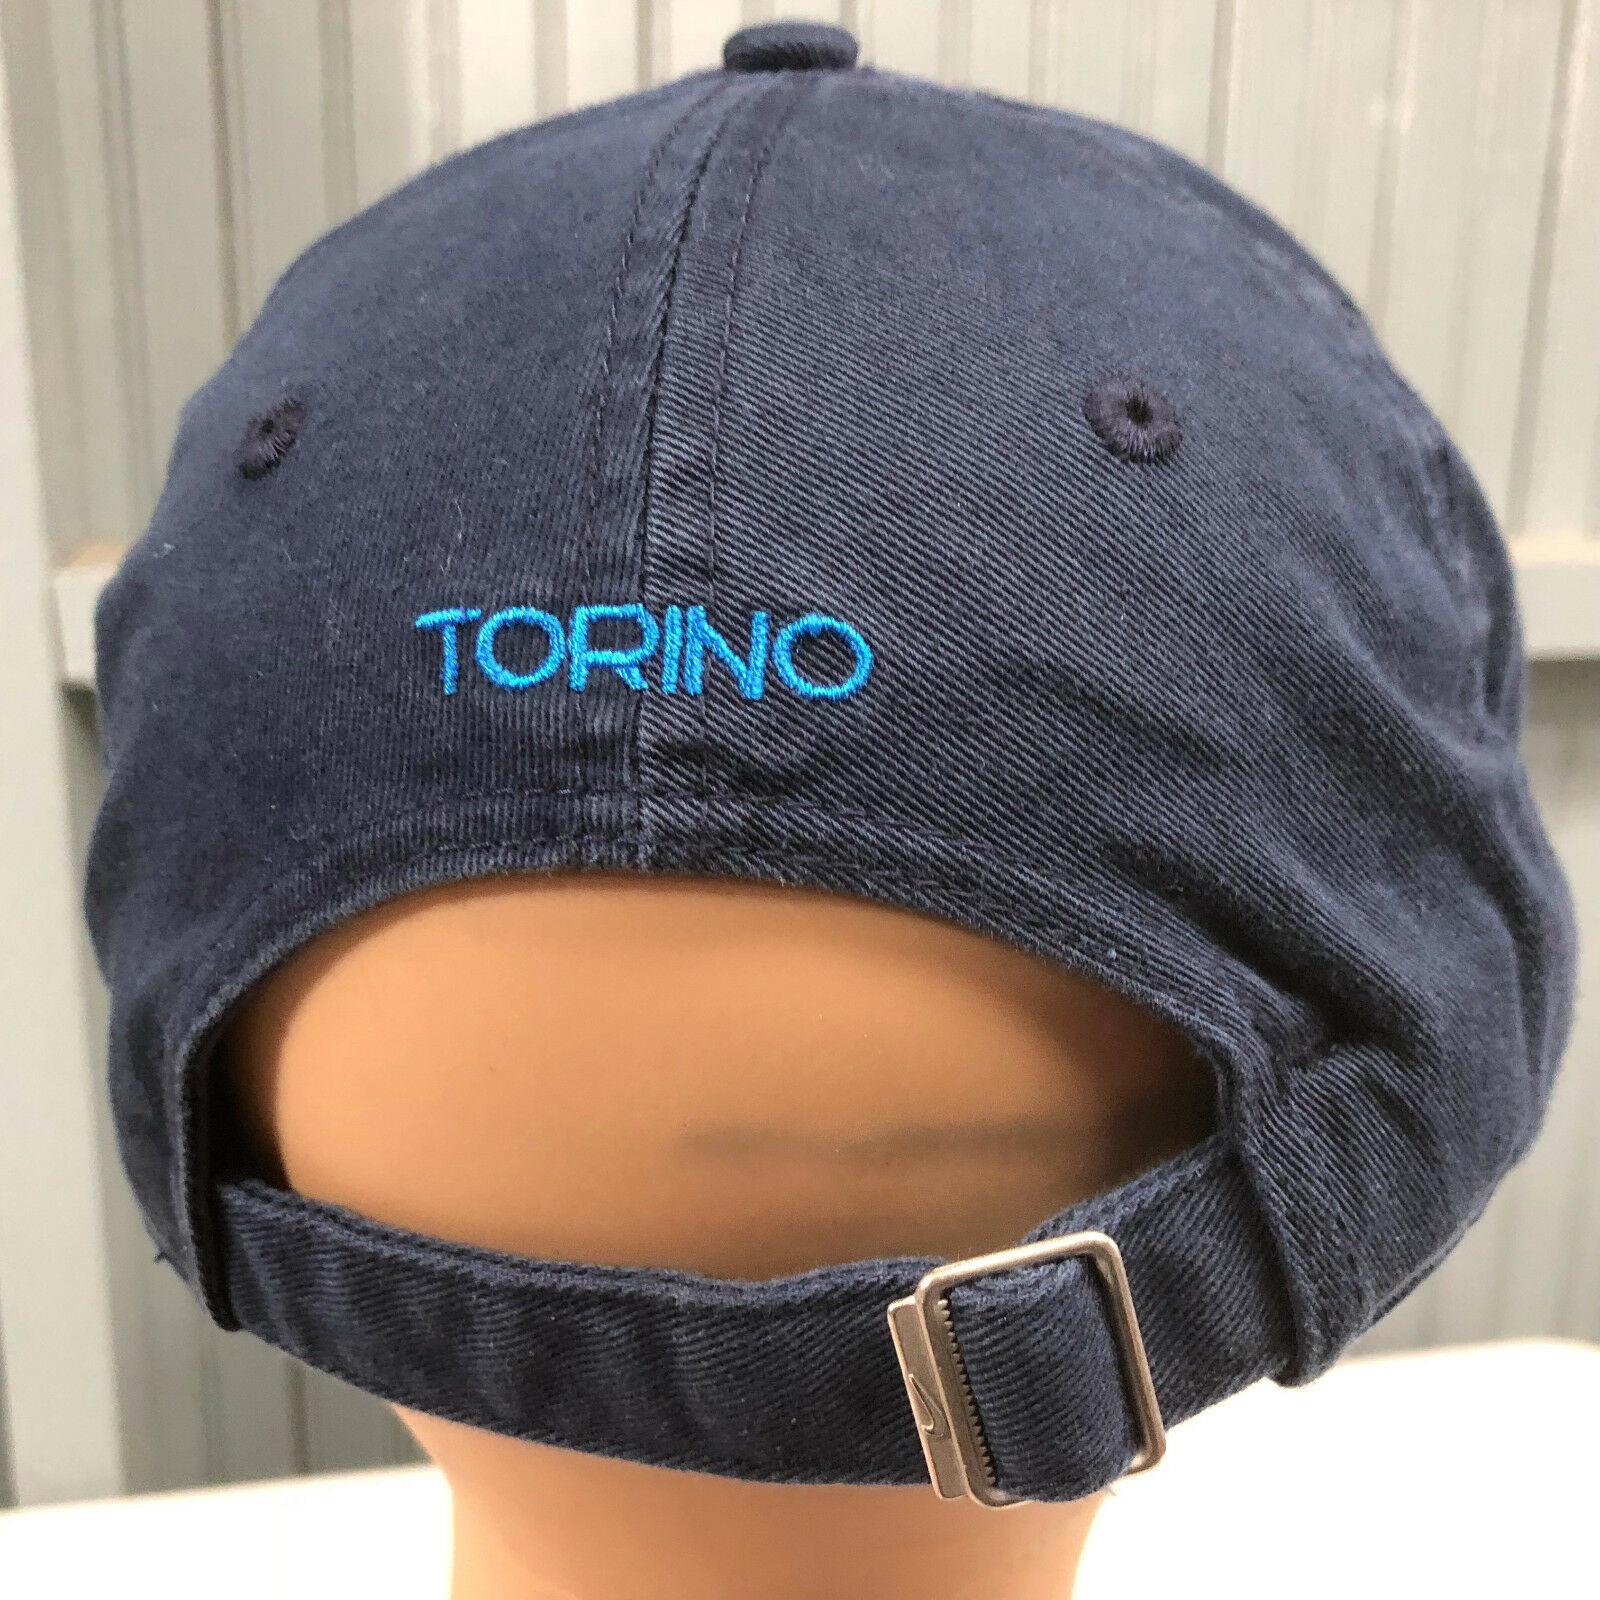 USA Olympics Torino Strapback Baseball Cap Hat